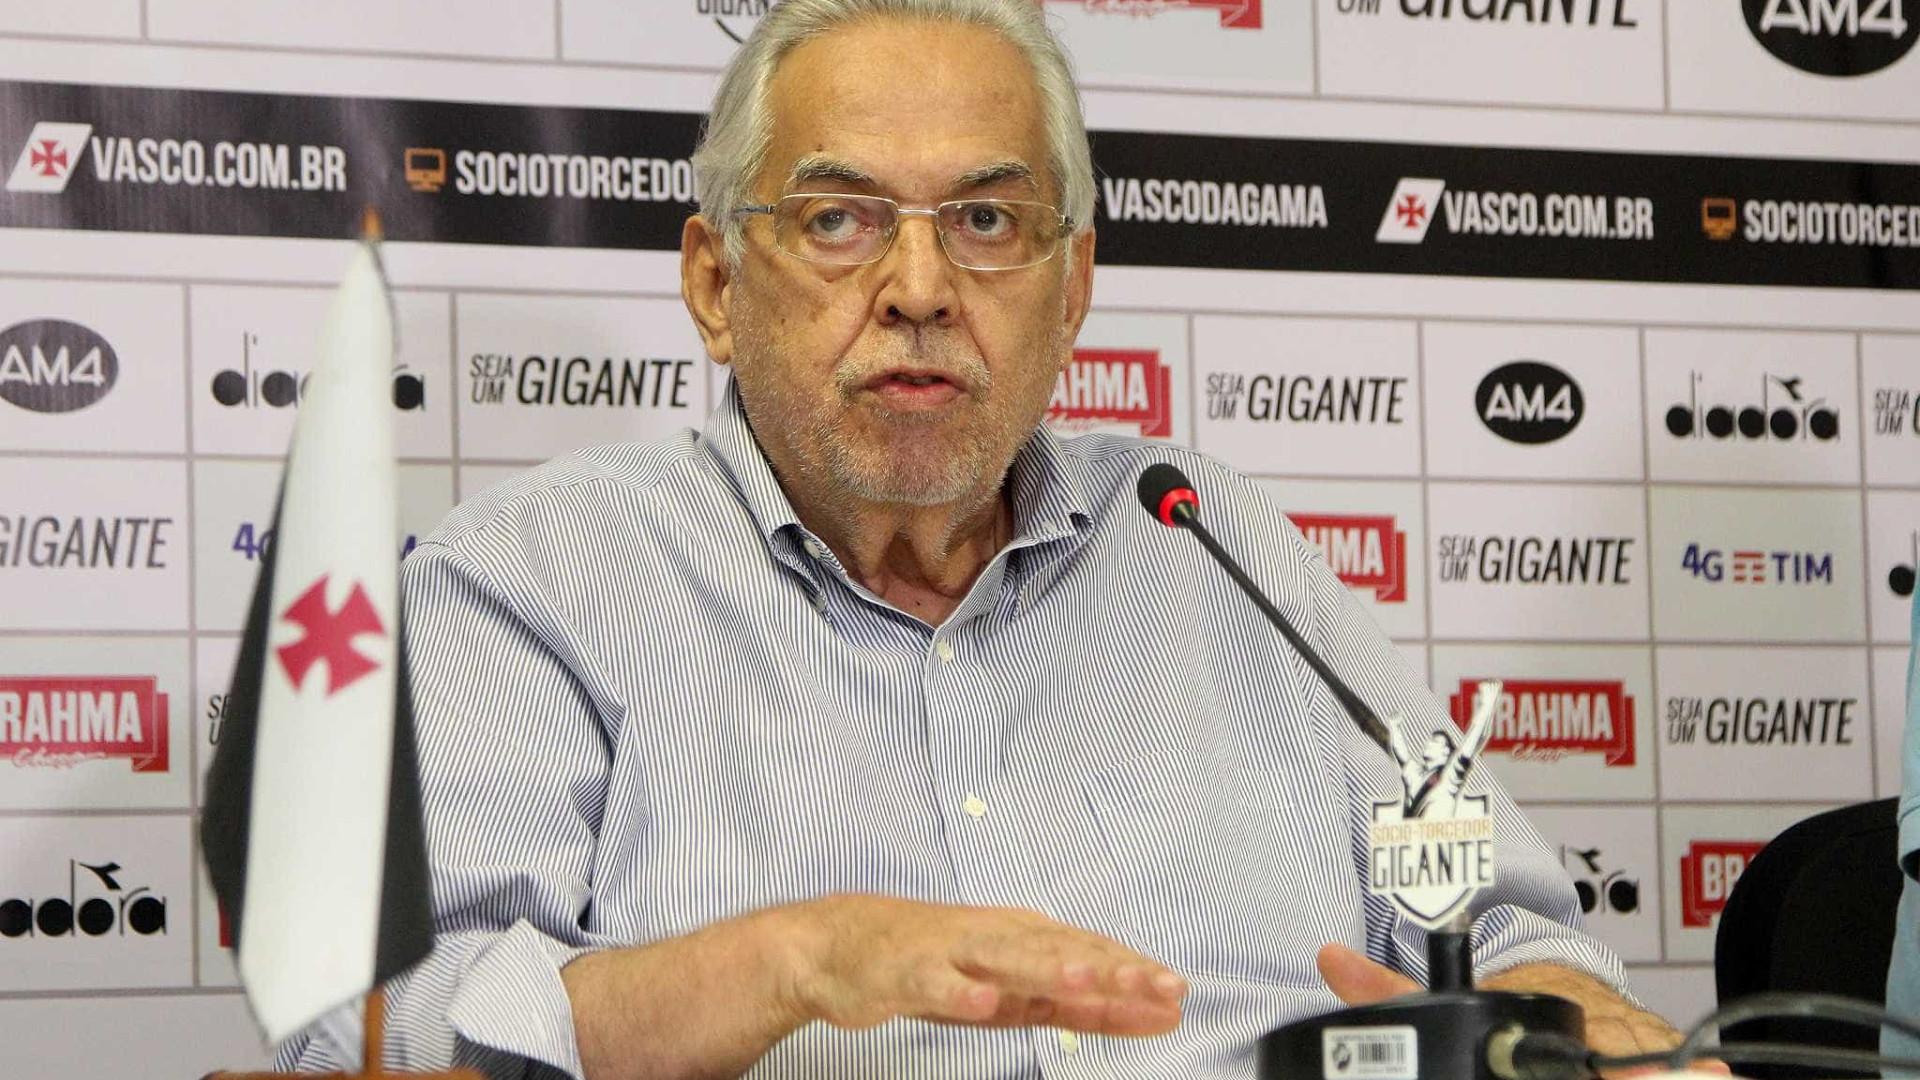 Morre o ex-presidente do Vasco Eurico Miranda, aos 74 anos